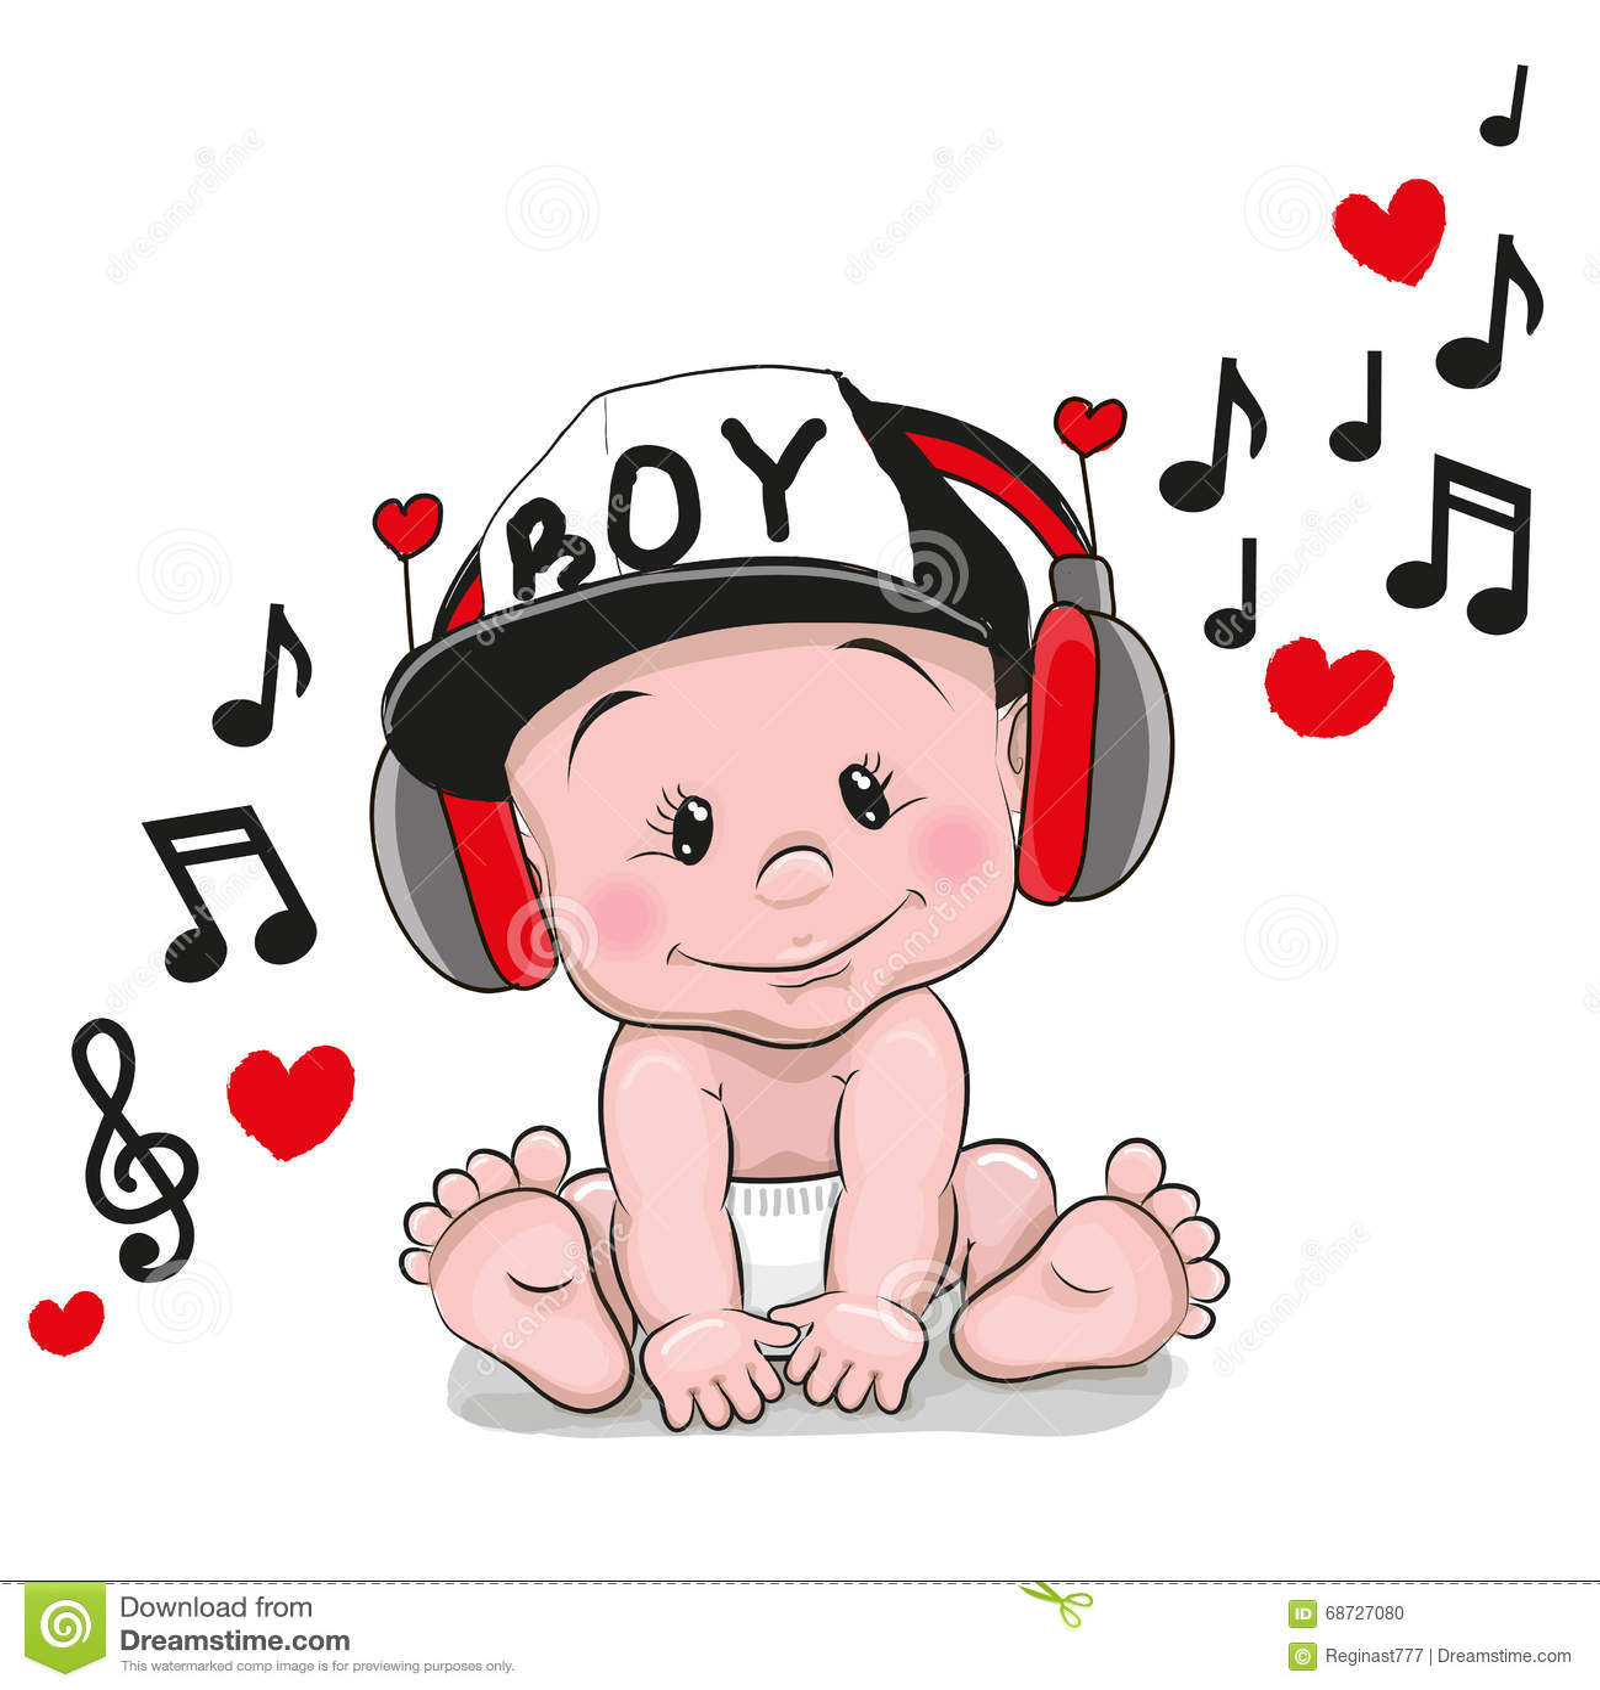 Cute Cartoon Baby Stock Vector - Image: 68727080